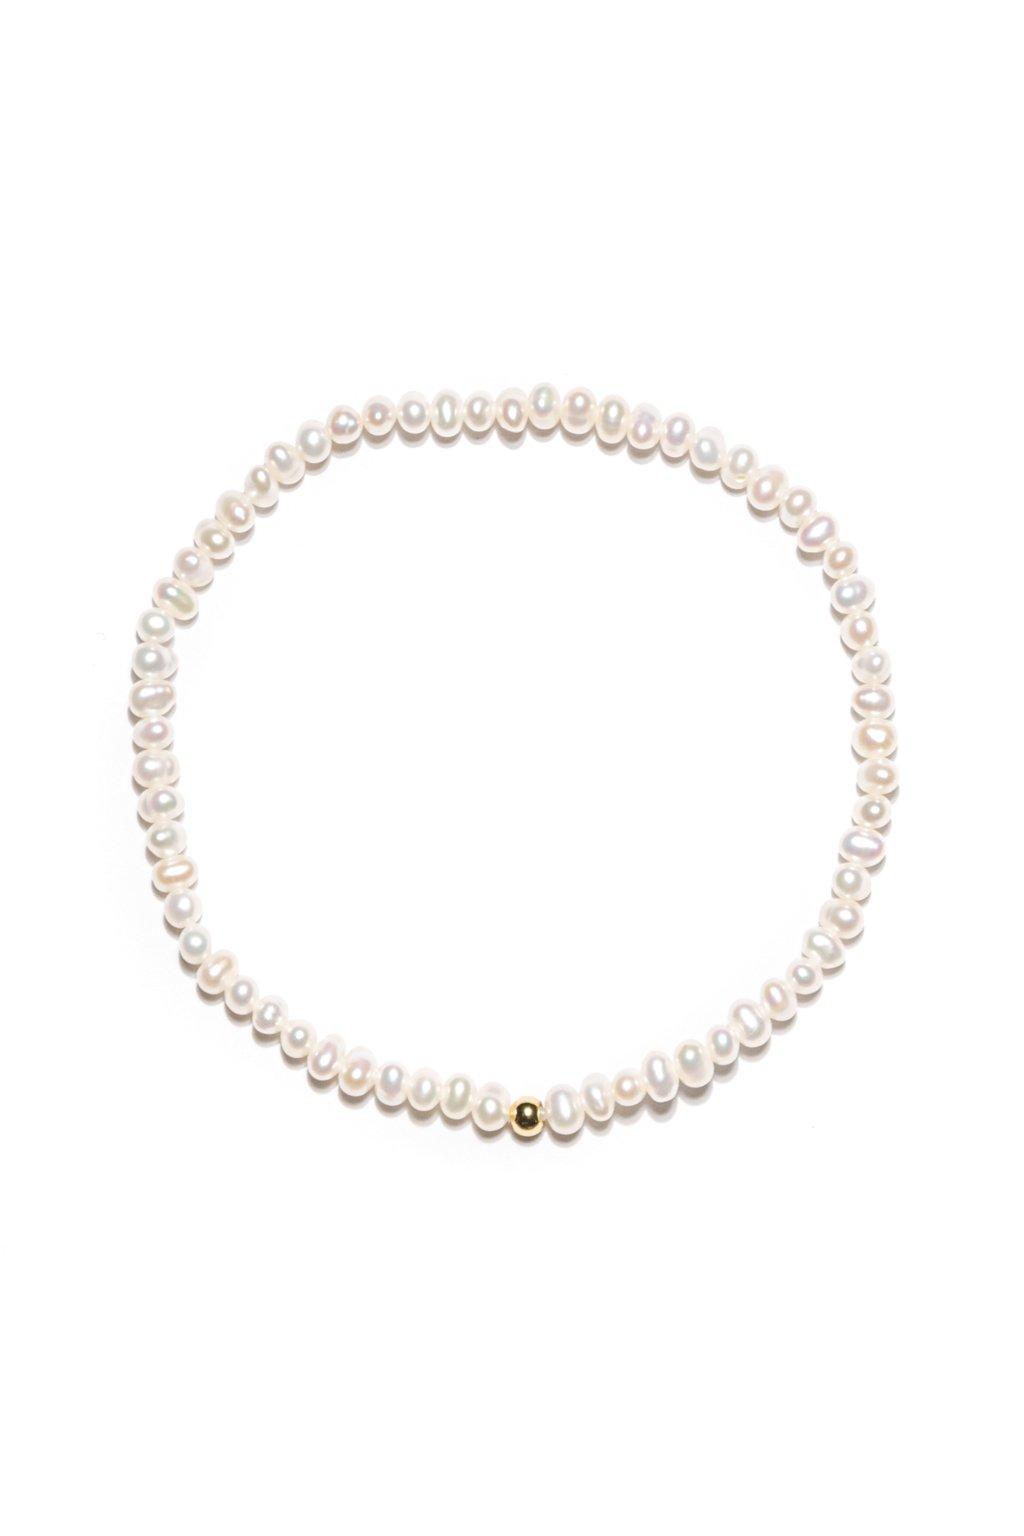 132 jemnulinký náramok riečna perla gold